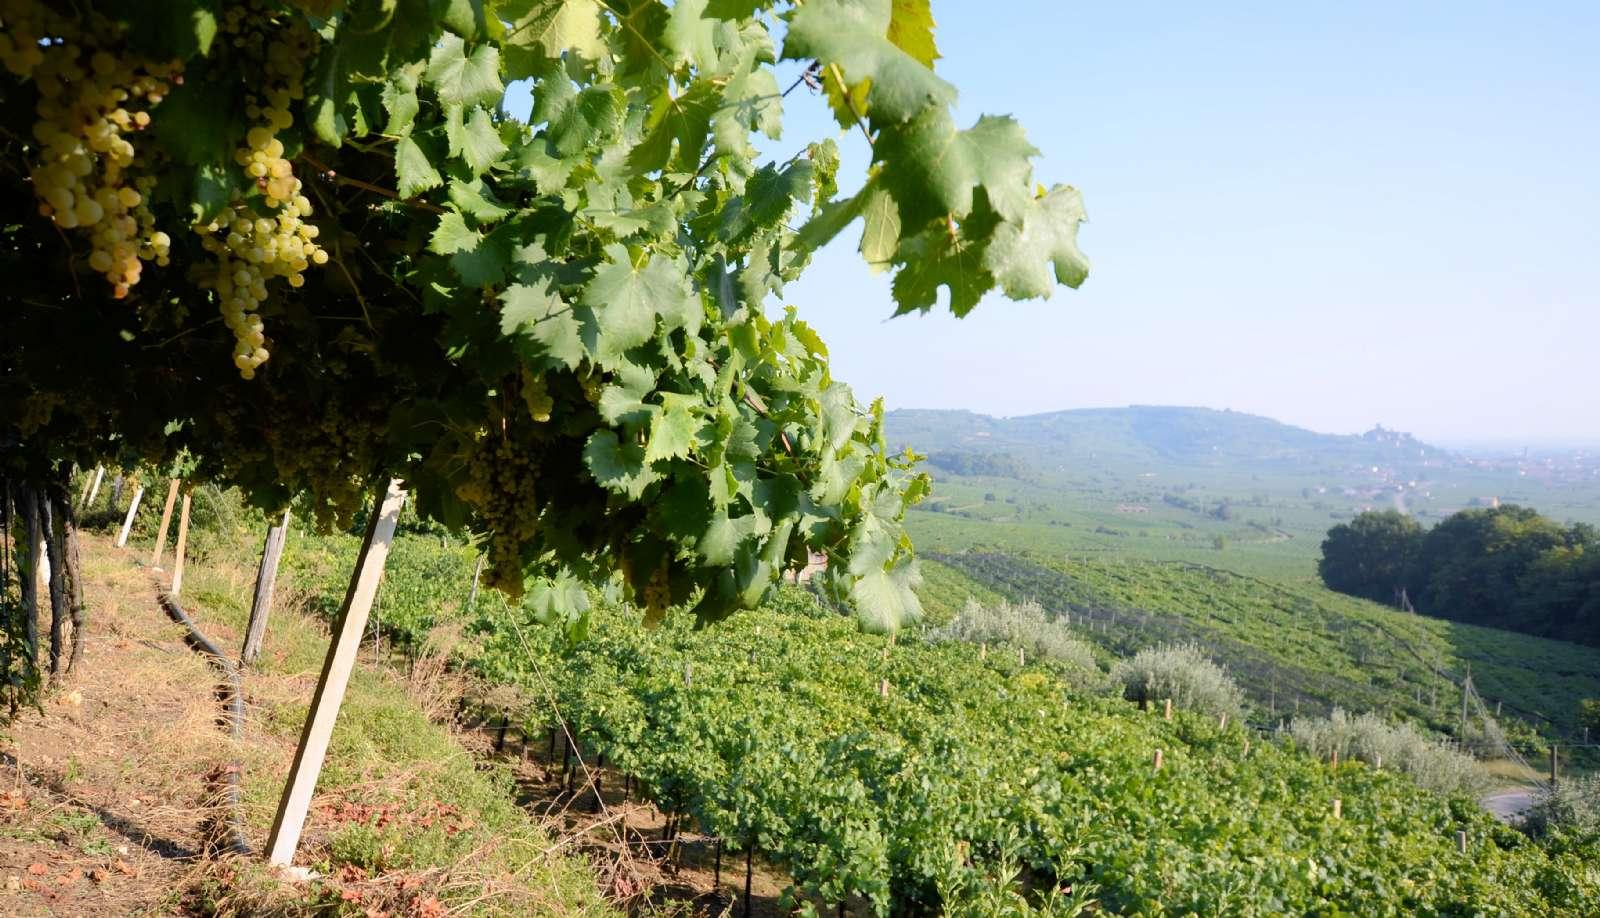 Des vignes à l'infini